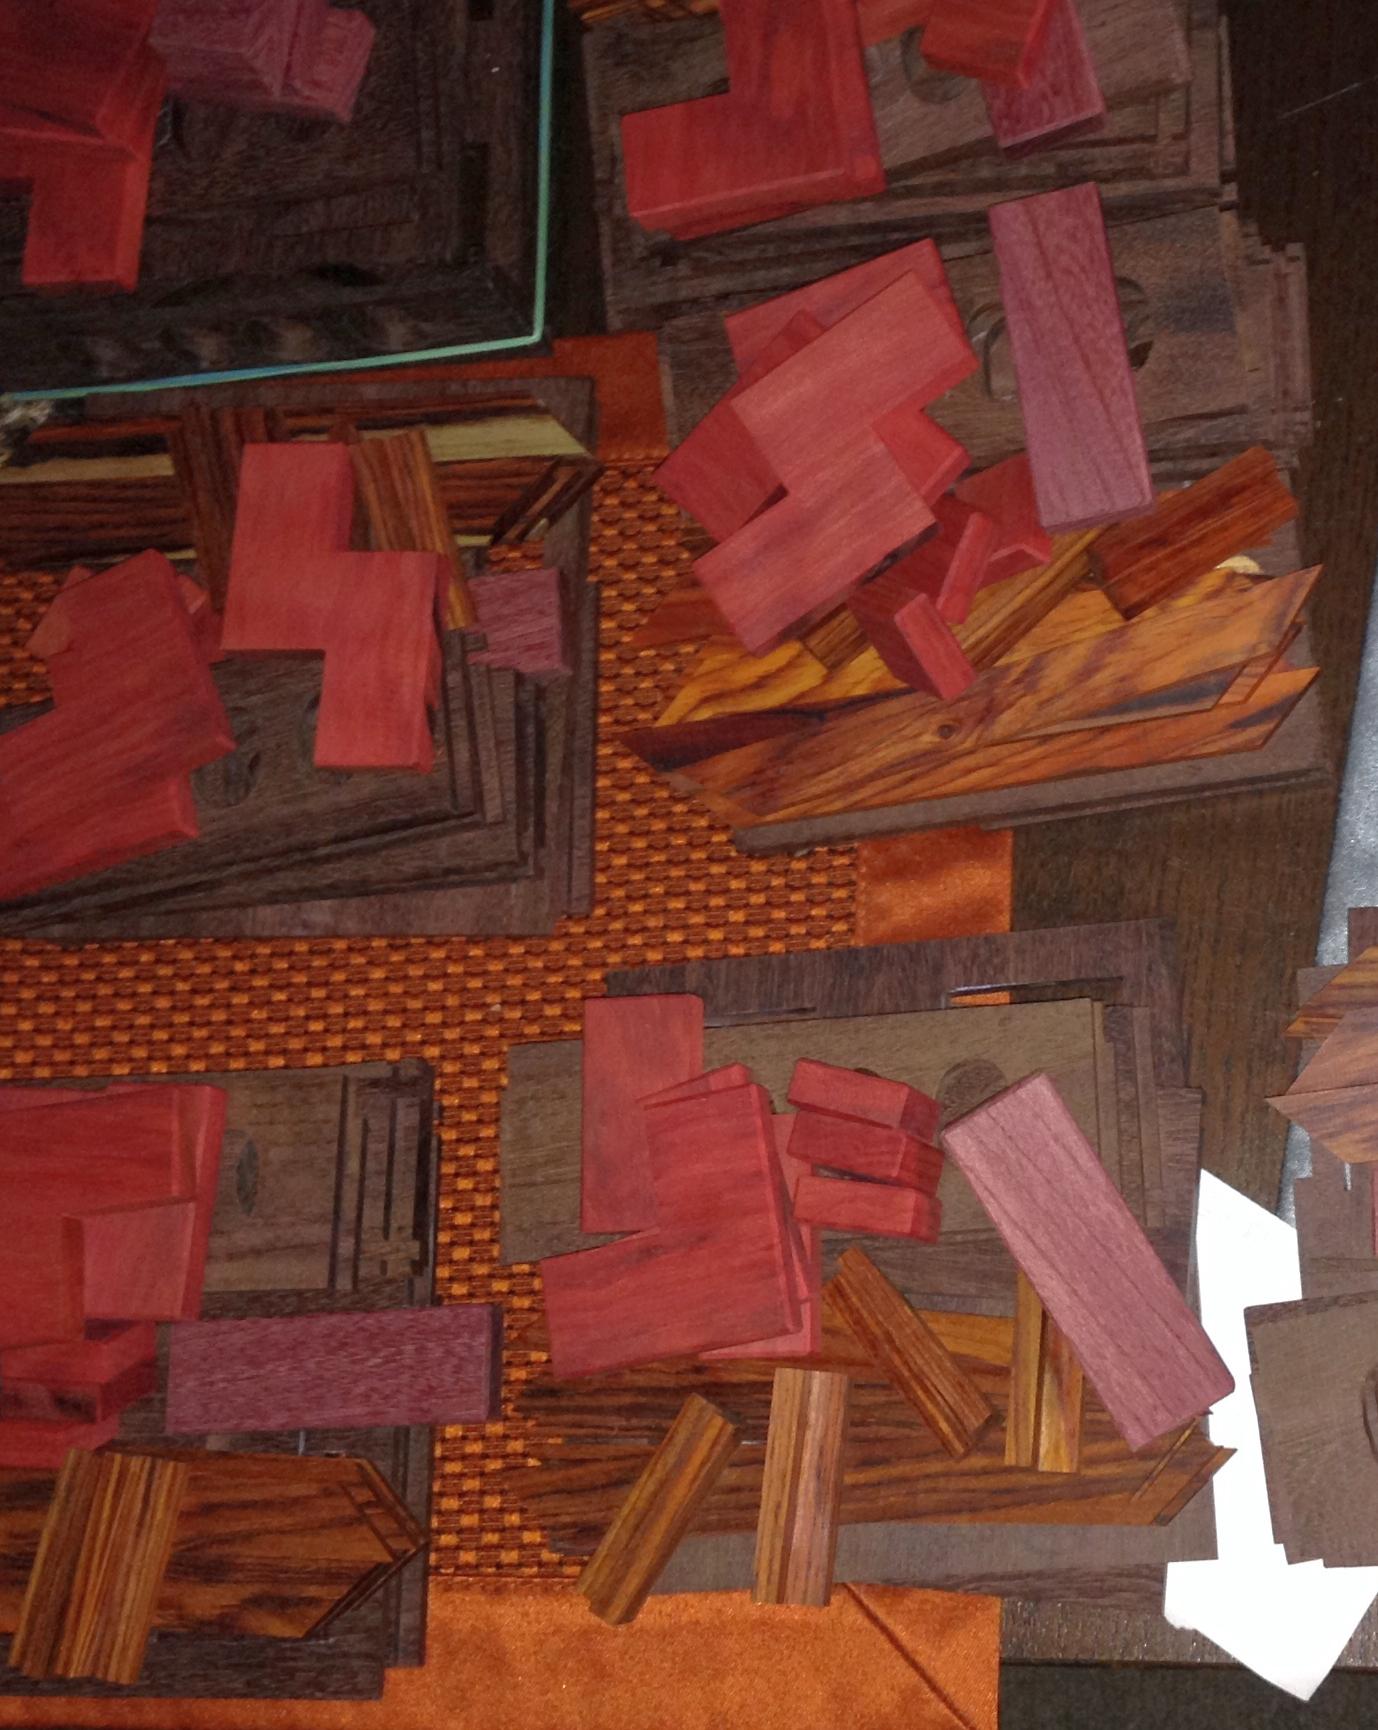 Piles of puzzle box pieces